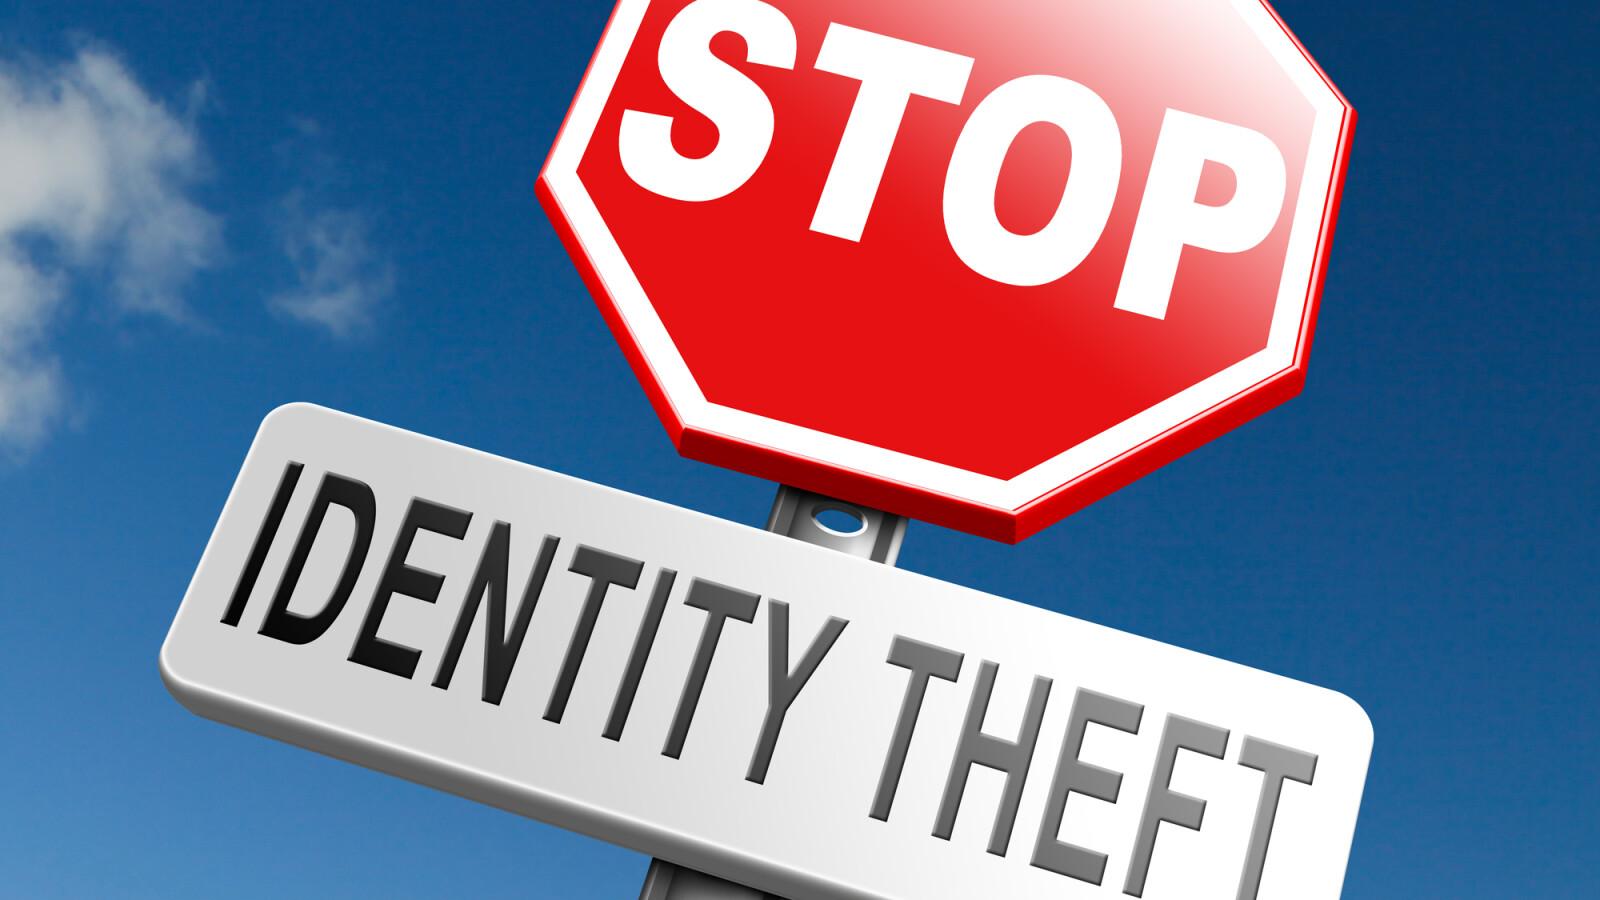 Identitätsdiebstahl Was Tun